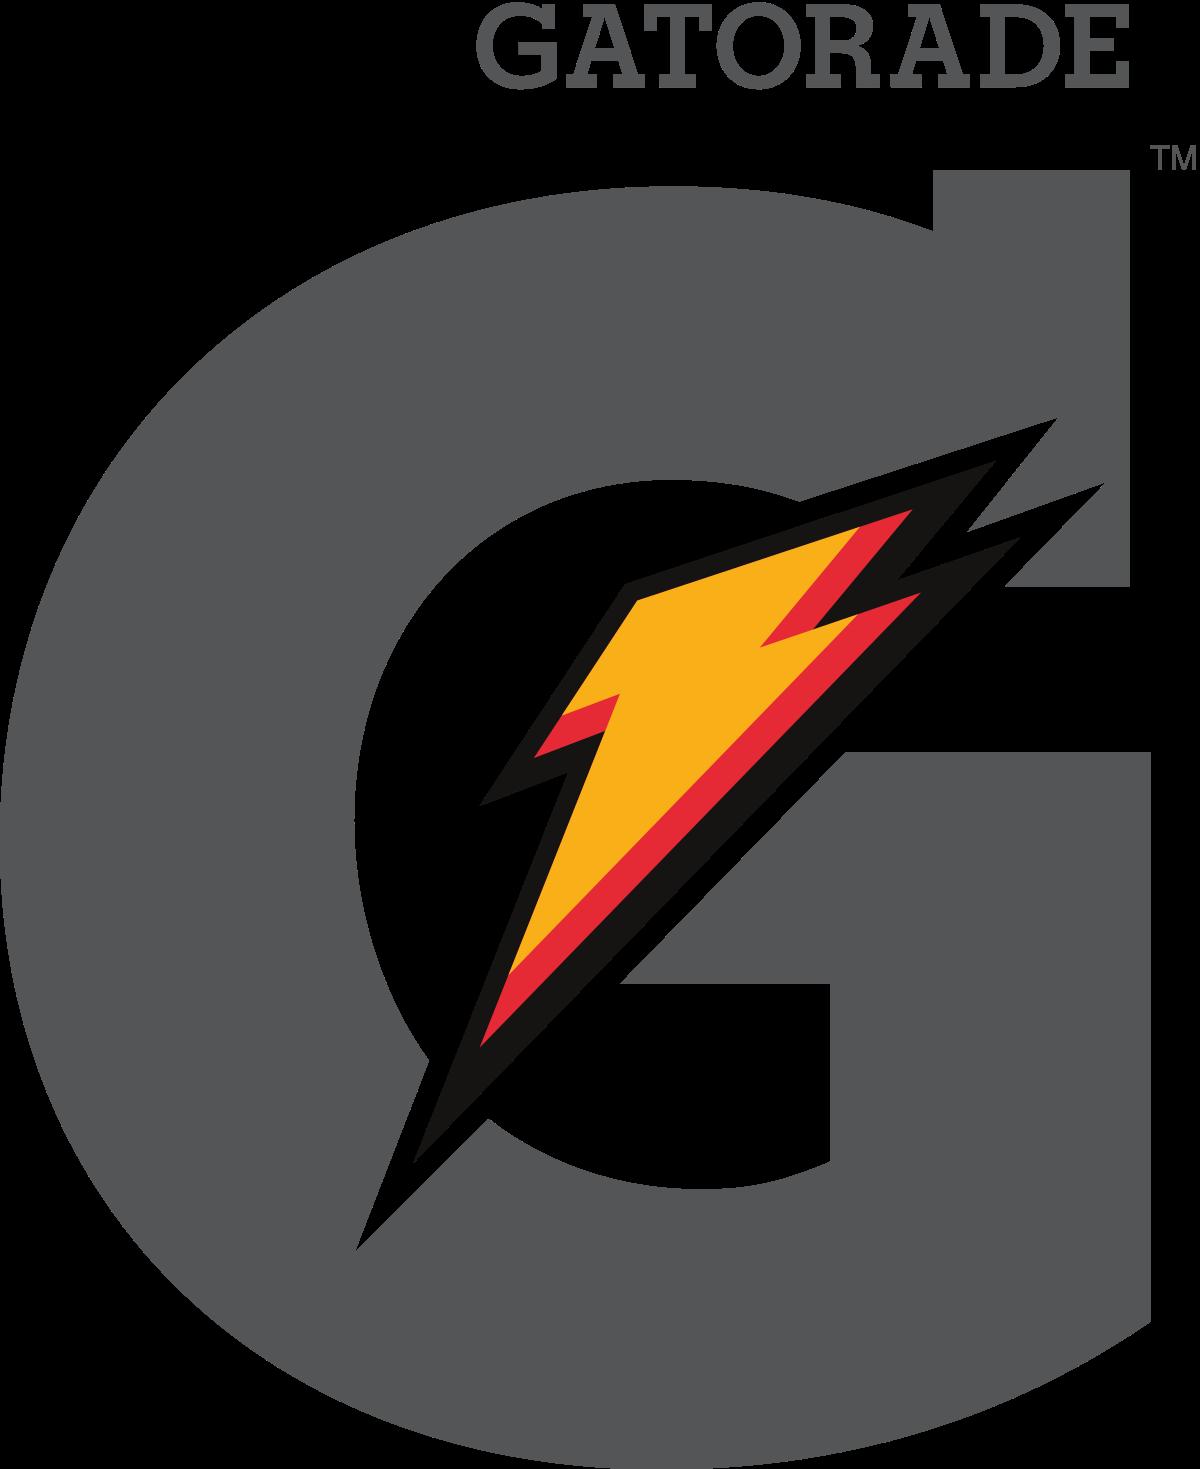 Gatorade   Wikipedia 1200x1469